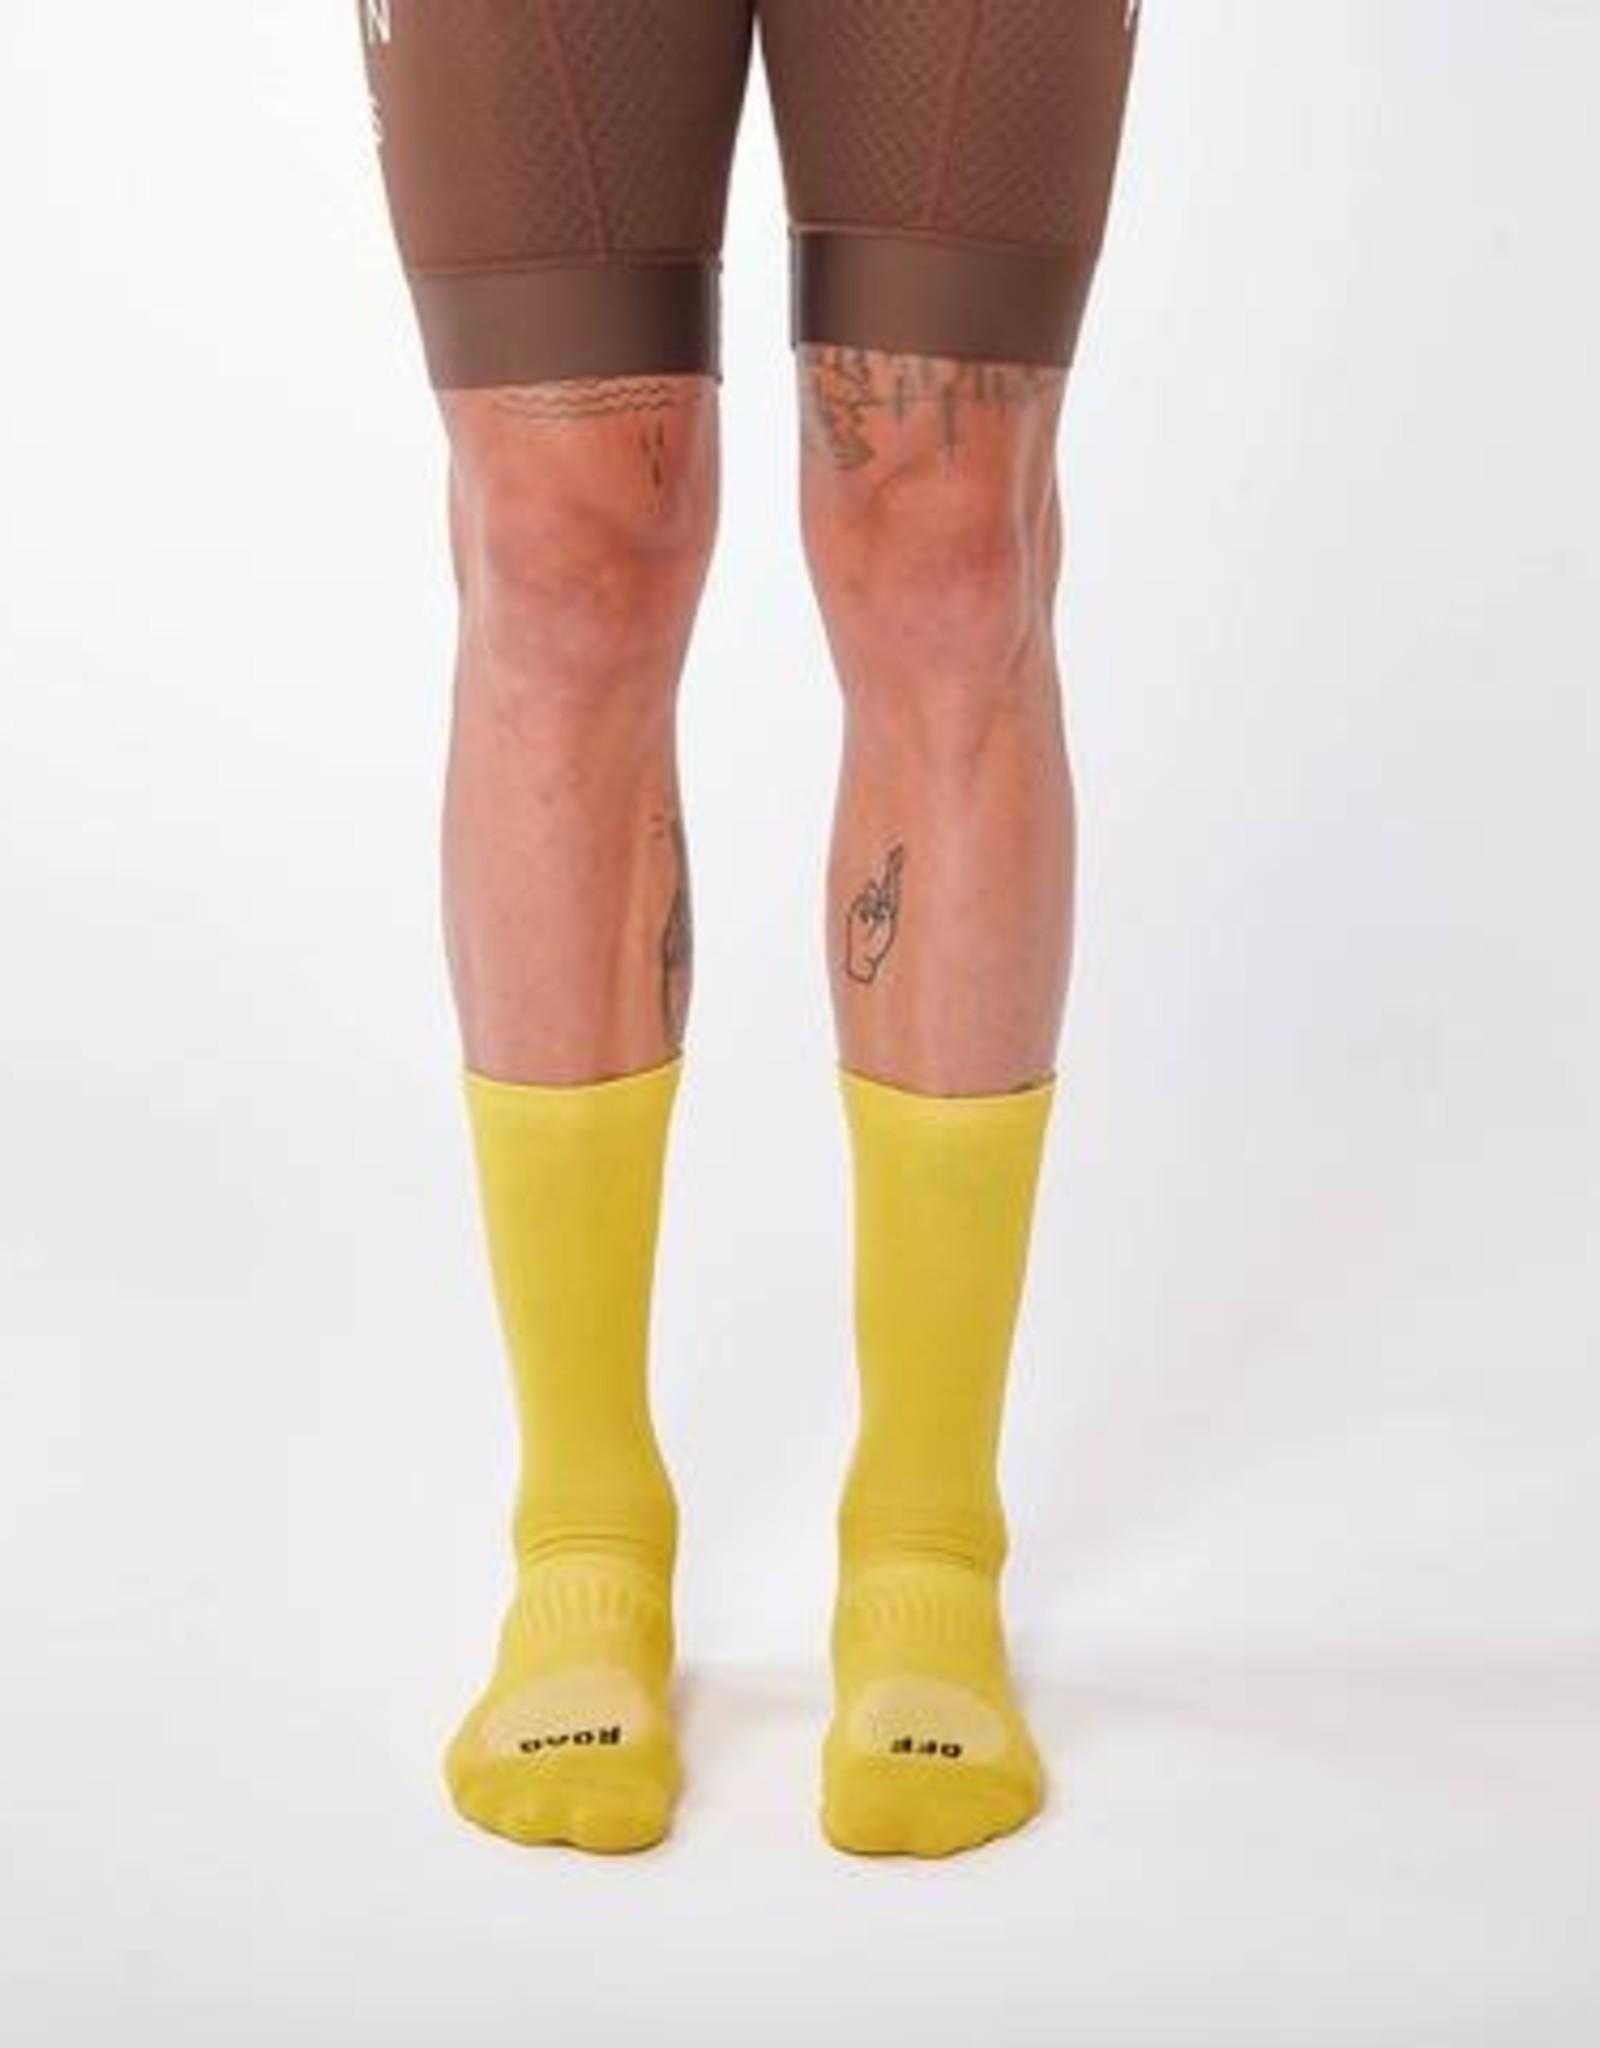 Fingerscrossed Off Road Cycling Socks - Mittelscharf